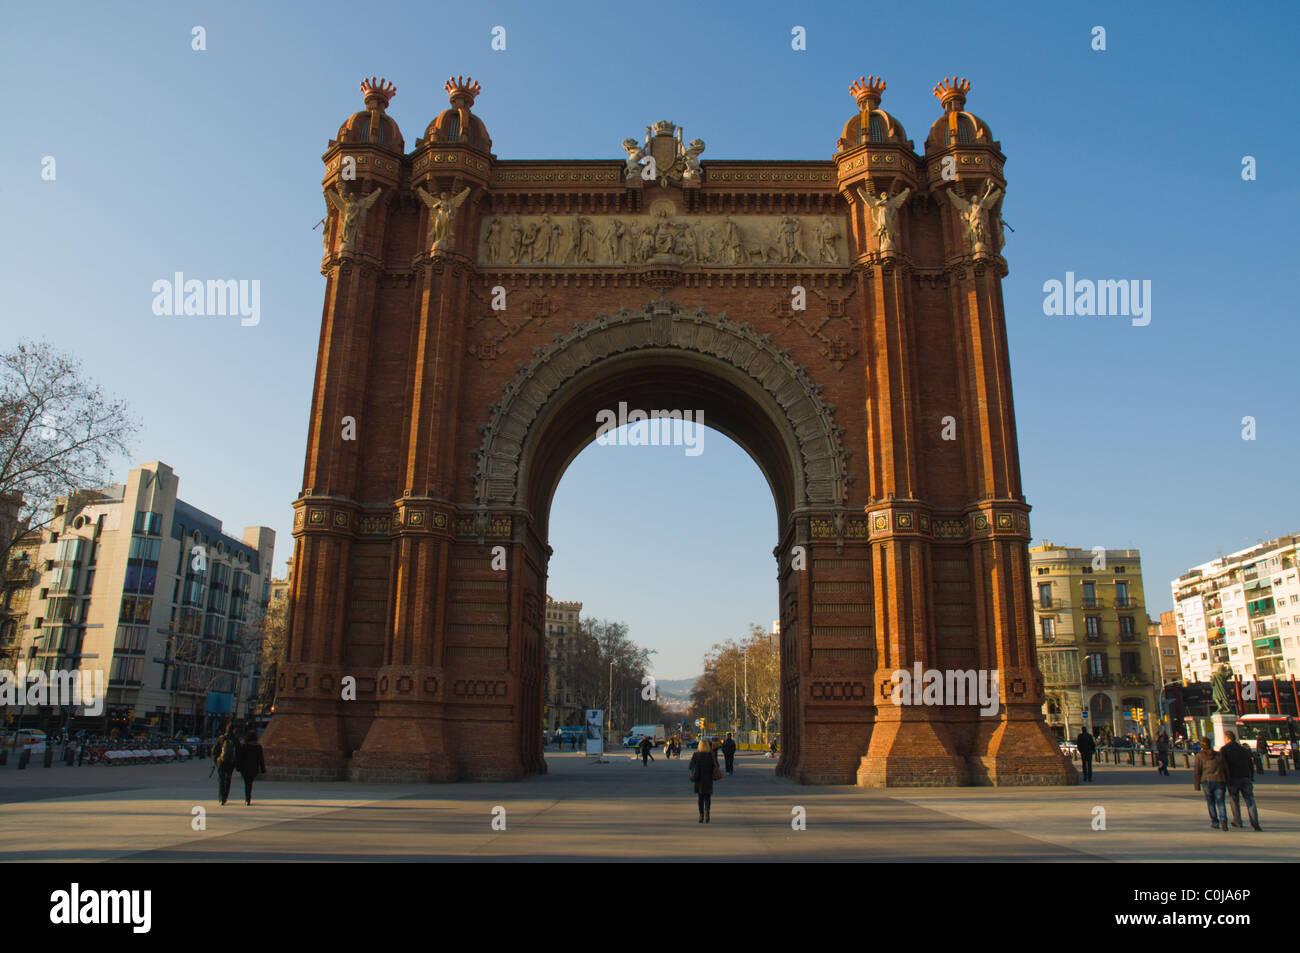 Arc de Triomf on Passeig de Llouis Companys pedestrian boulevard central Barcelona Catalunya Spain Europe - Stock Image